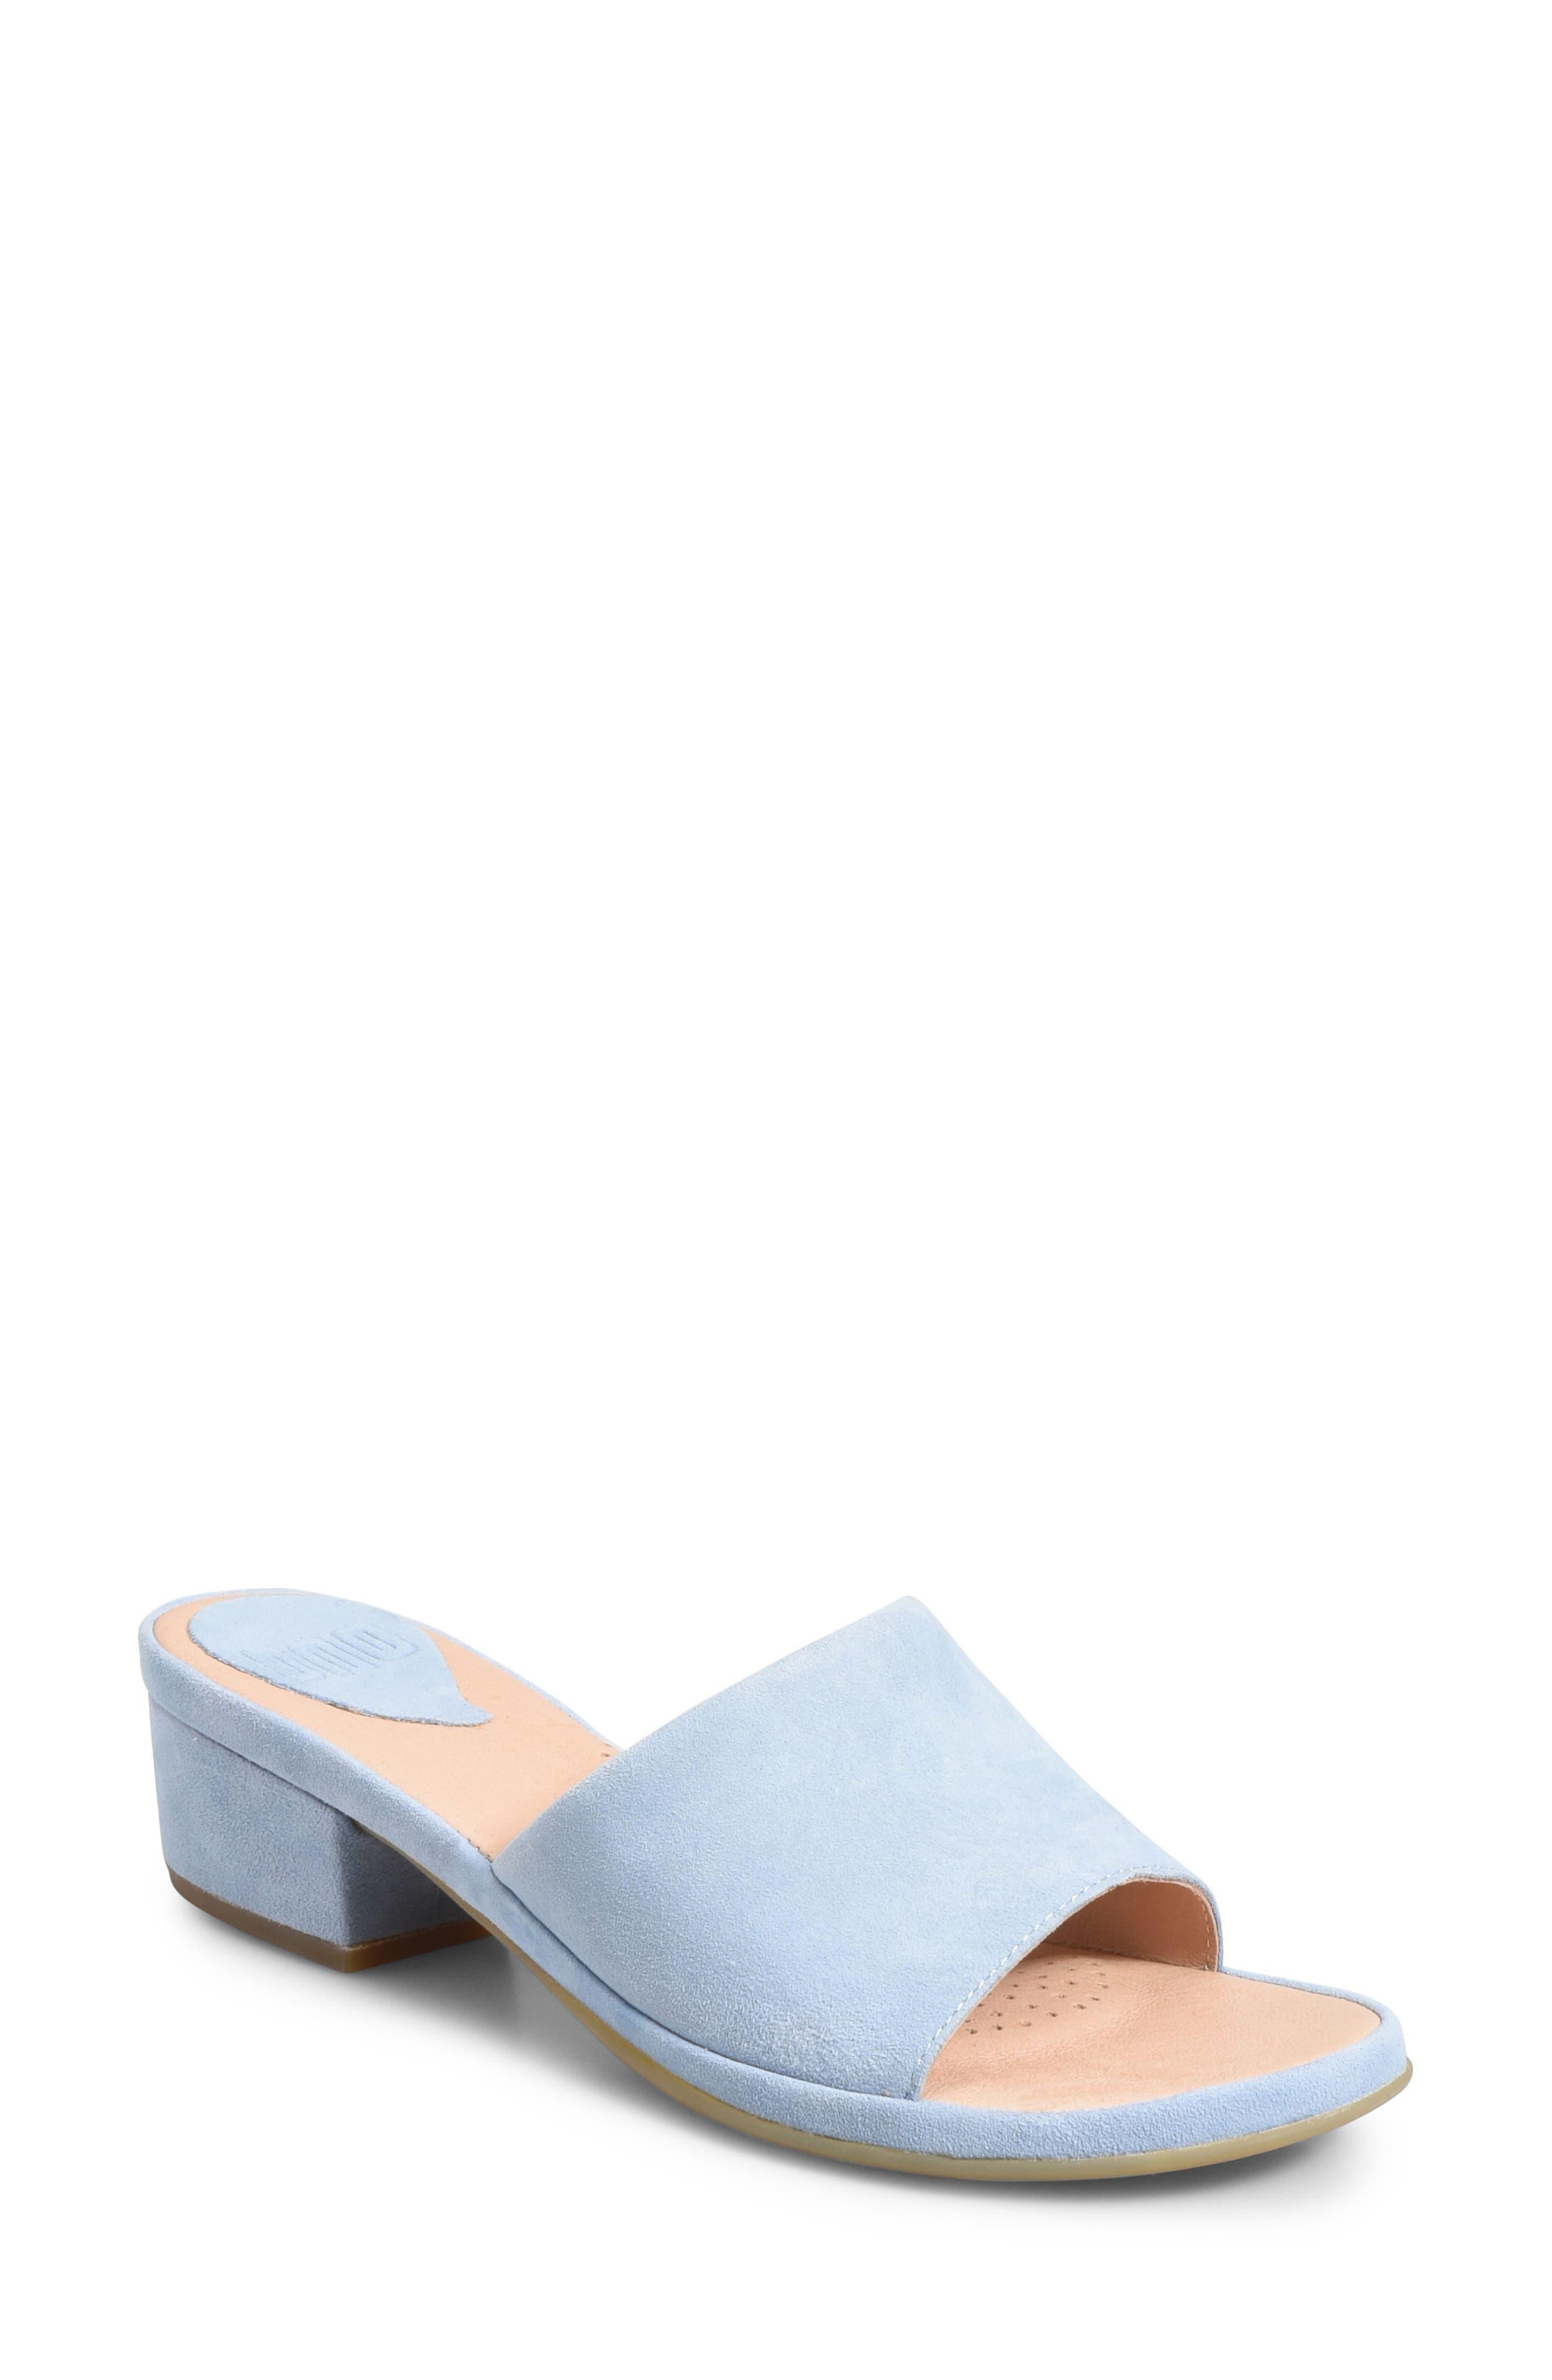 Bo Block Heel Slide Sandal,                             Main thumbnail 1, color,                             Light Blue Suede